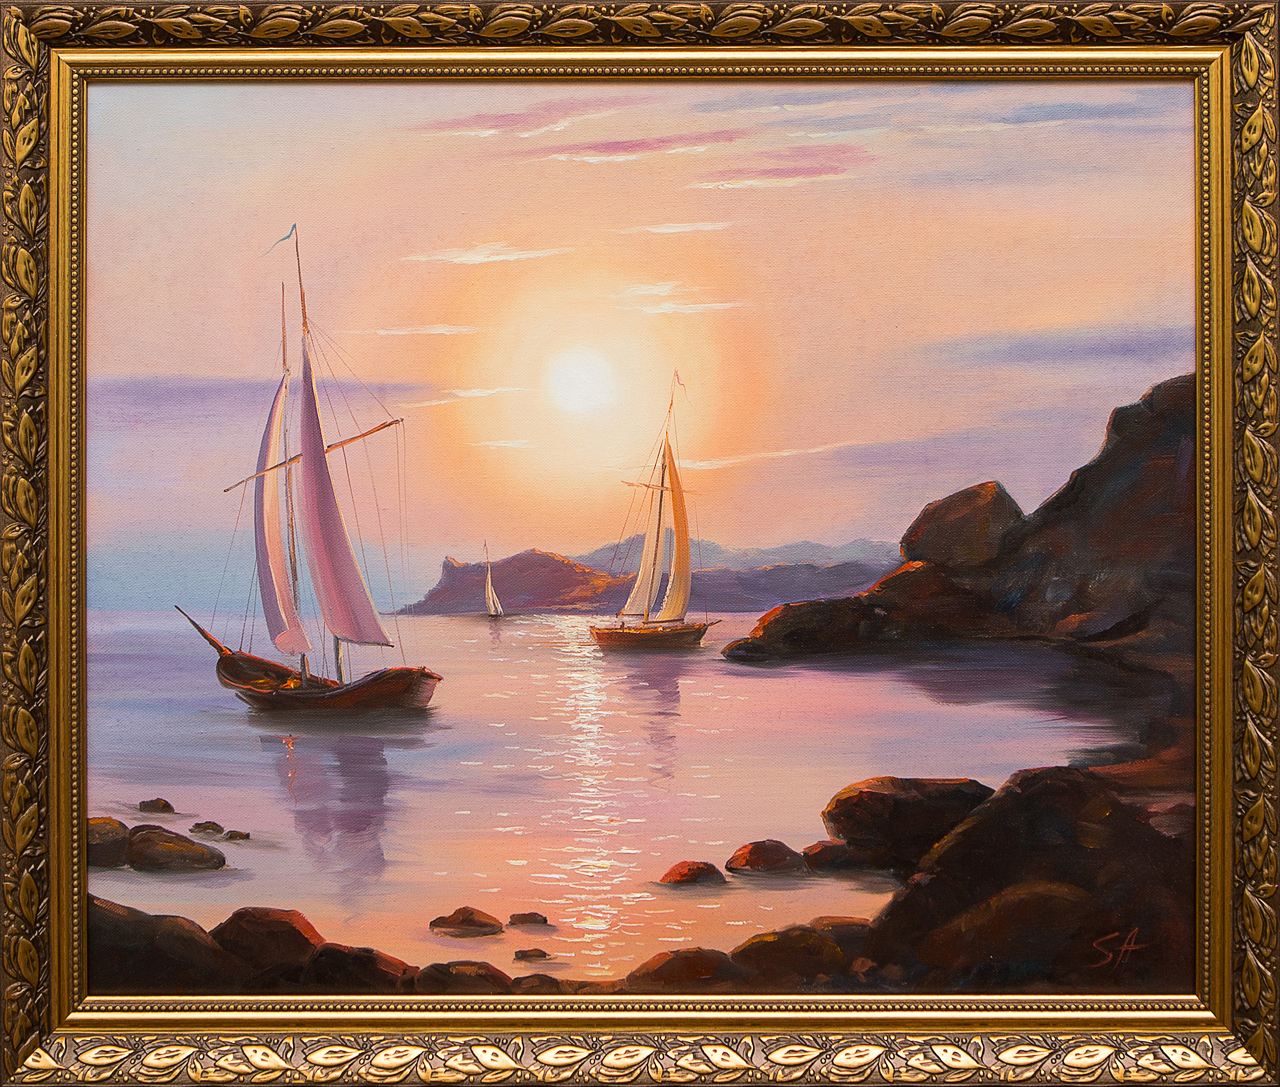 Картина маслом Корабли у берега моря Арушанян